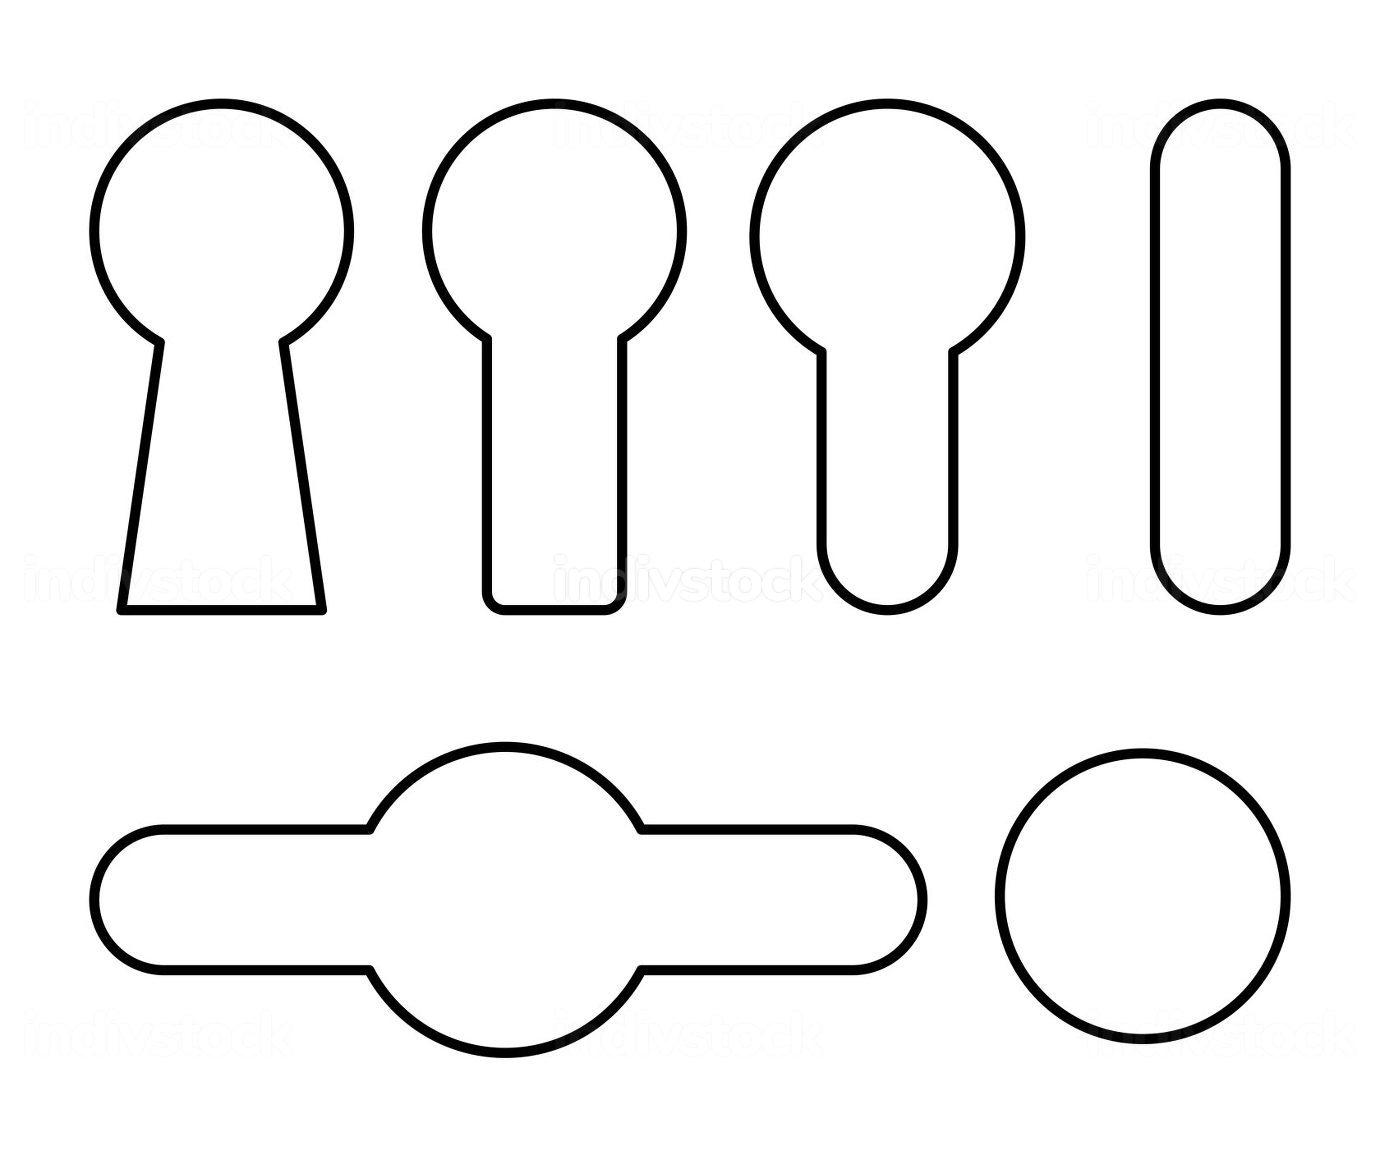 Keyhole outline symbol set. Line contour shapes collections with